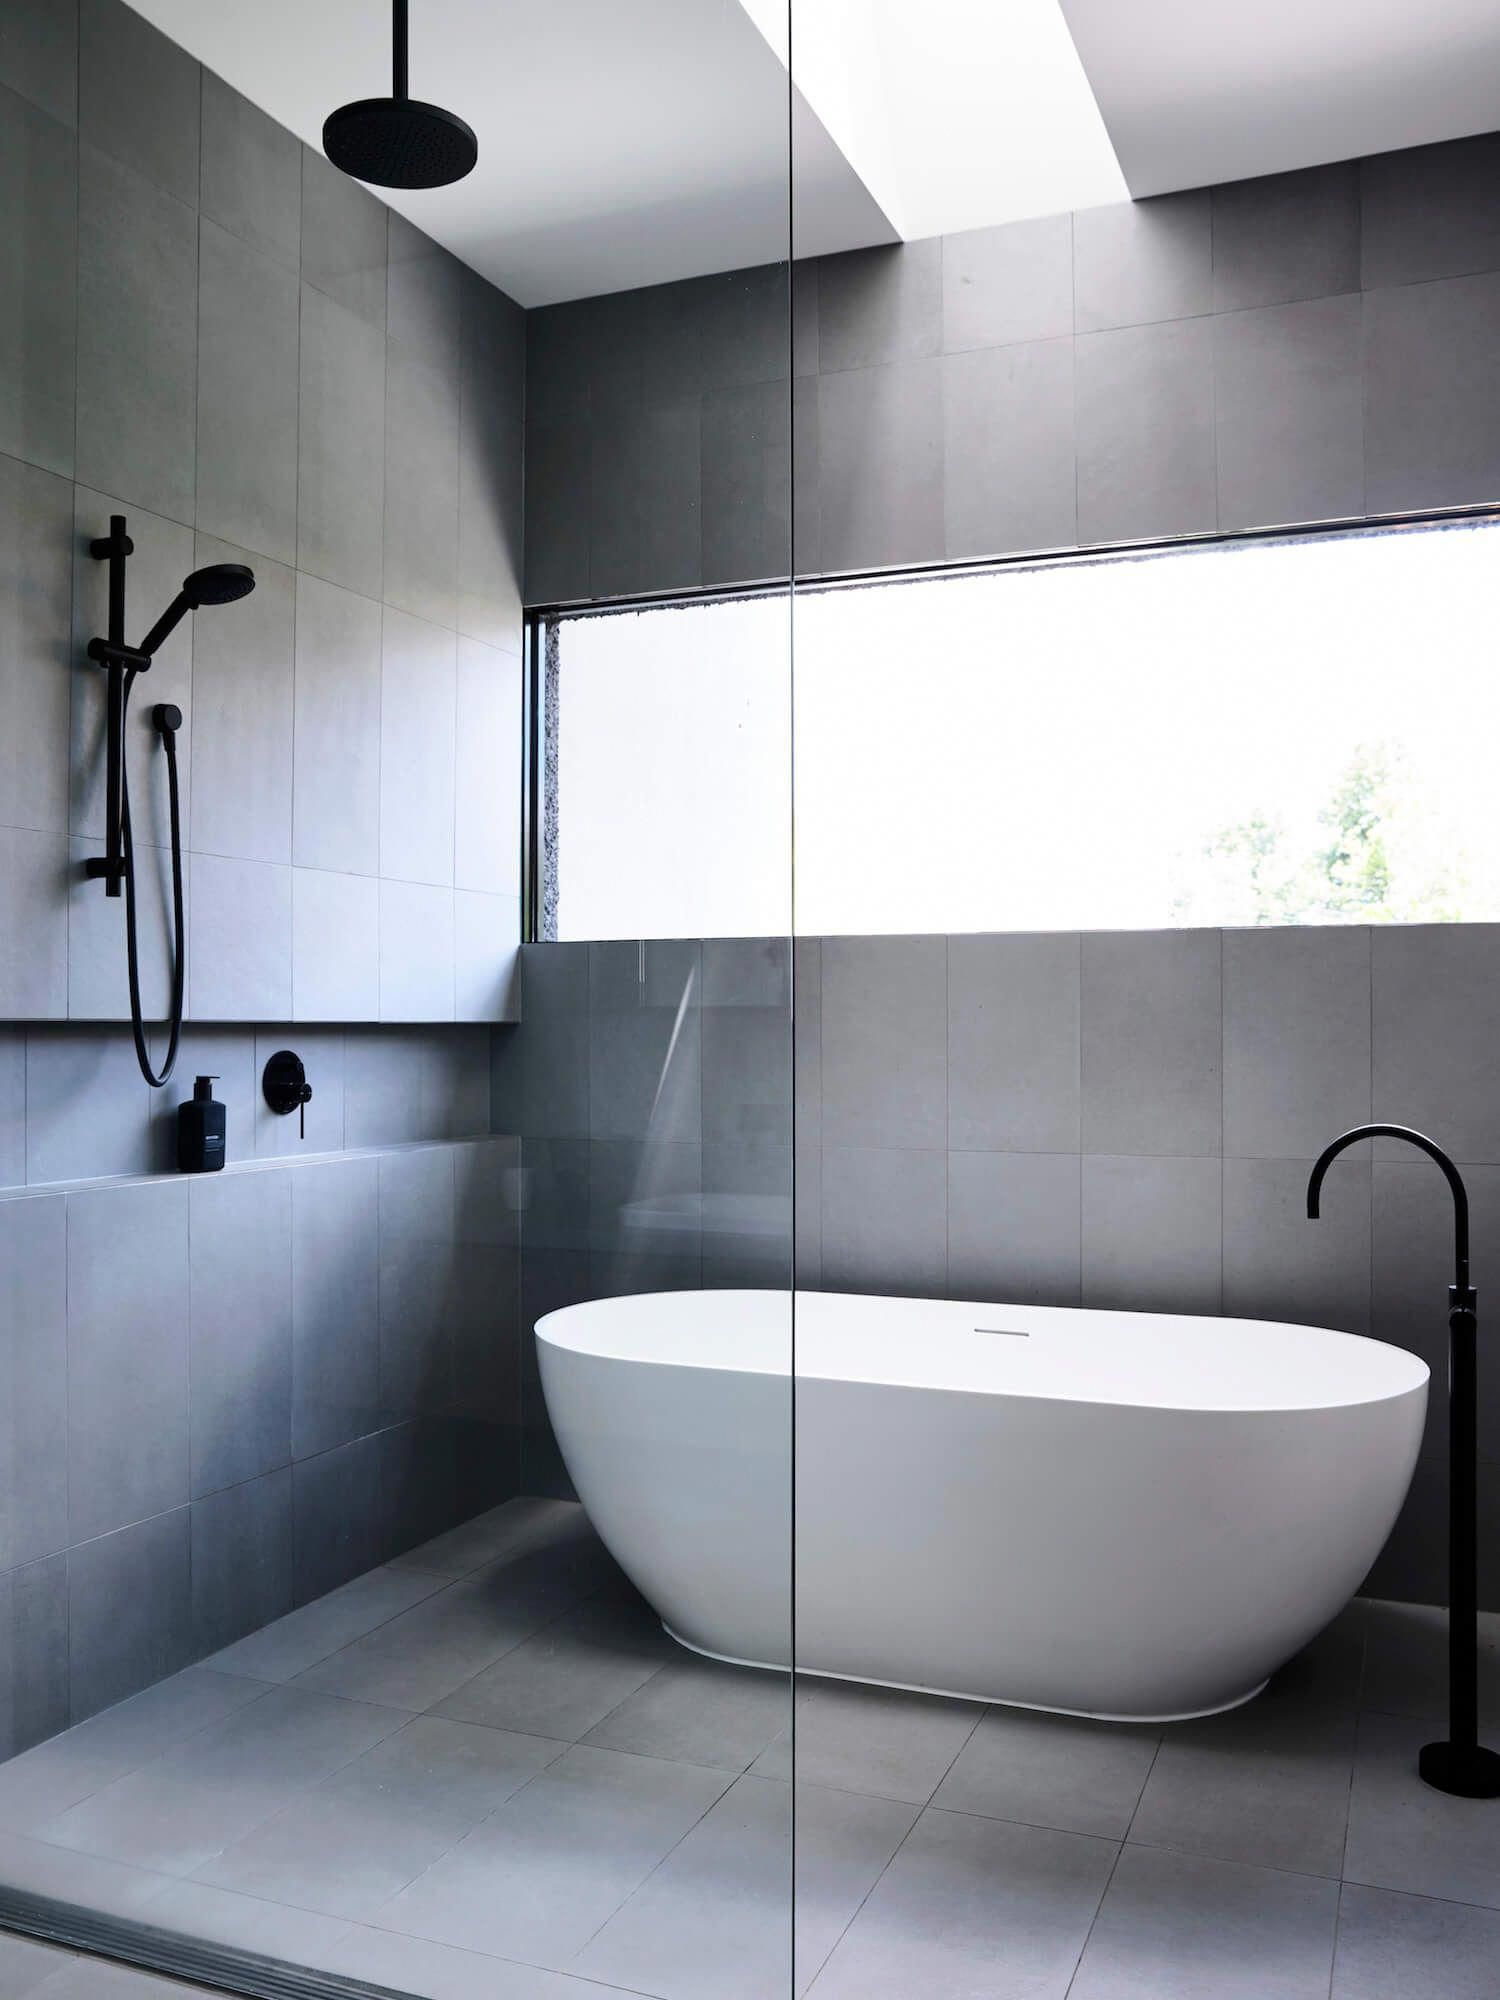 luxe salle de bains showroom sallesdebains tariq in 2019 rh hu pinterest com